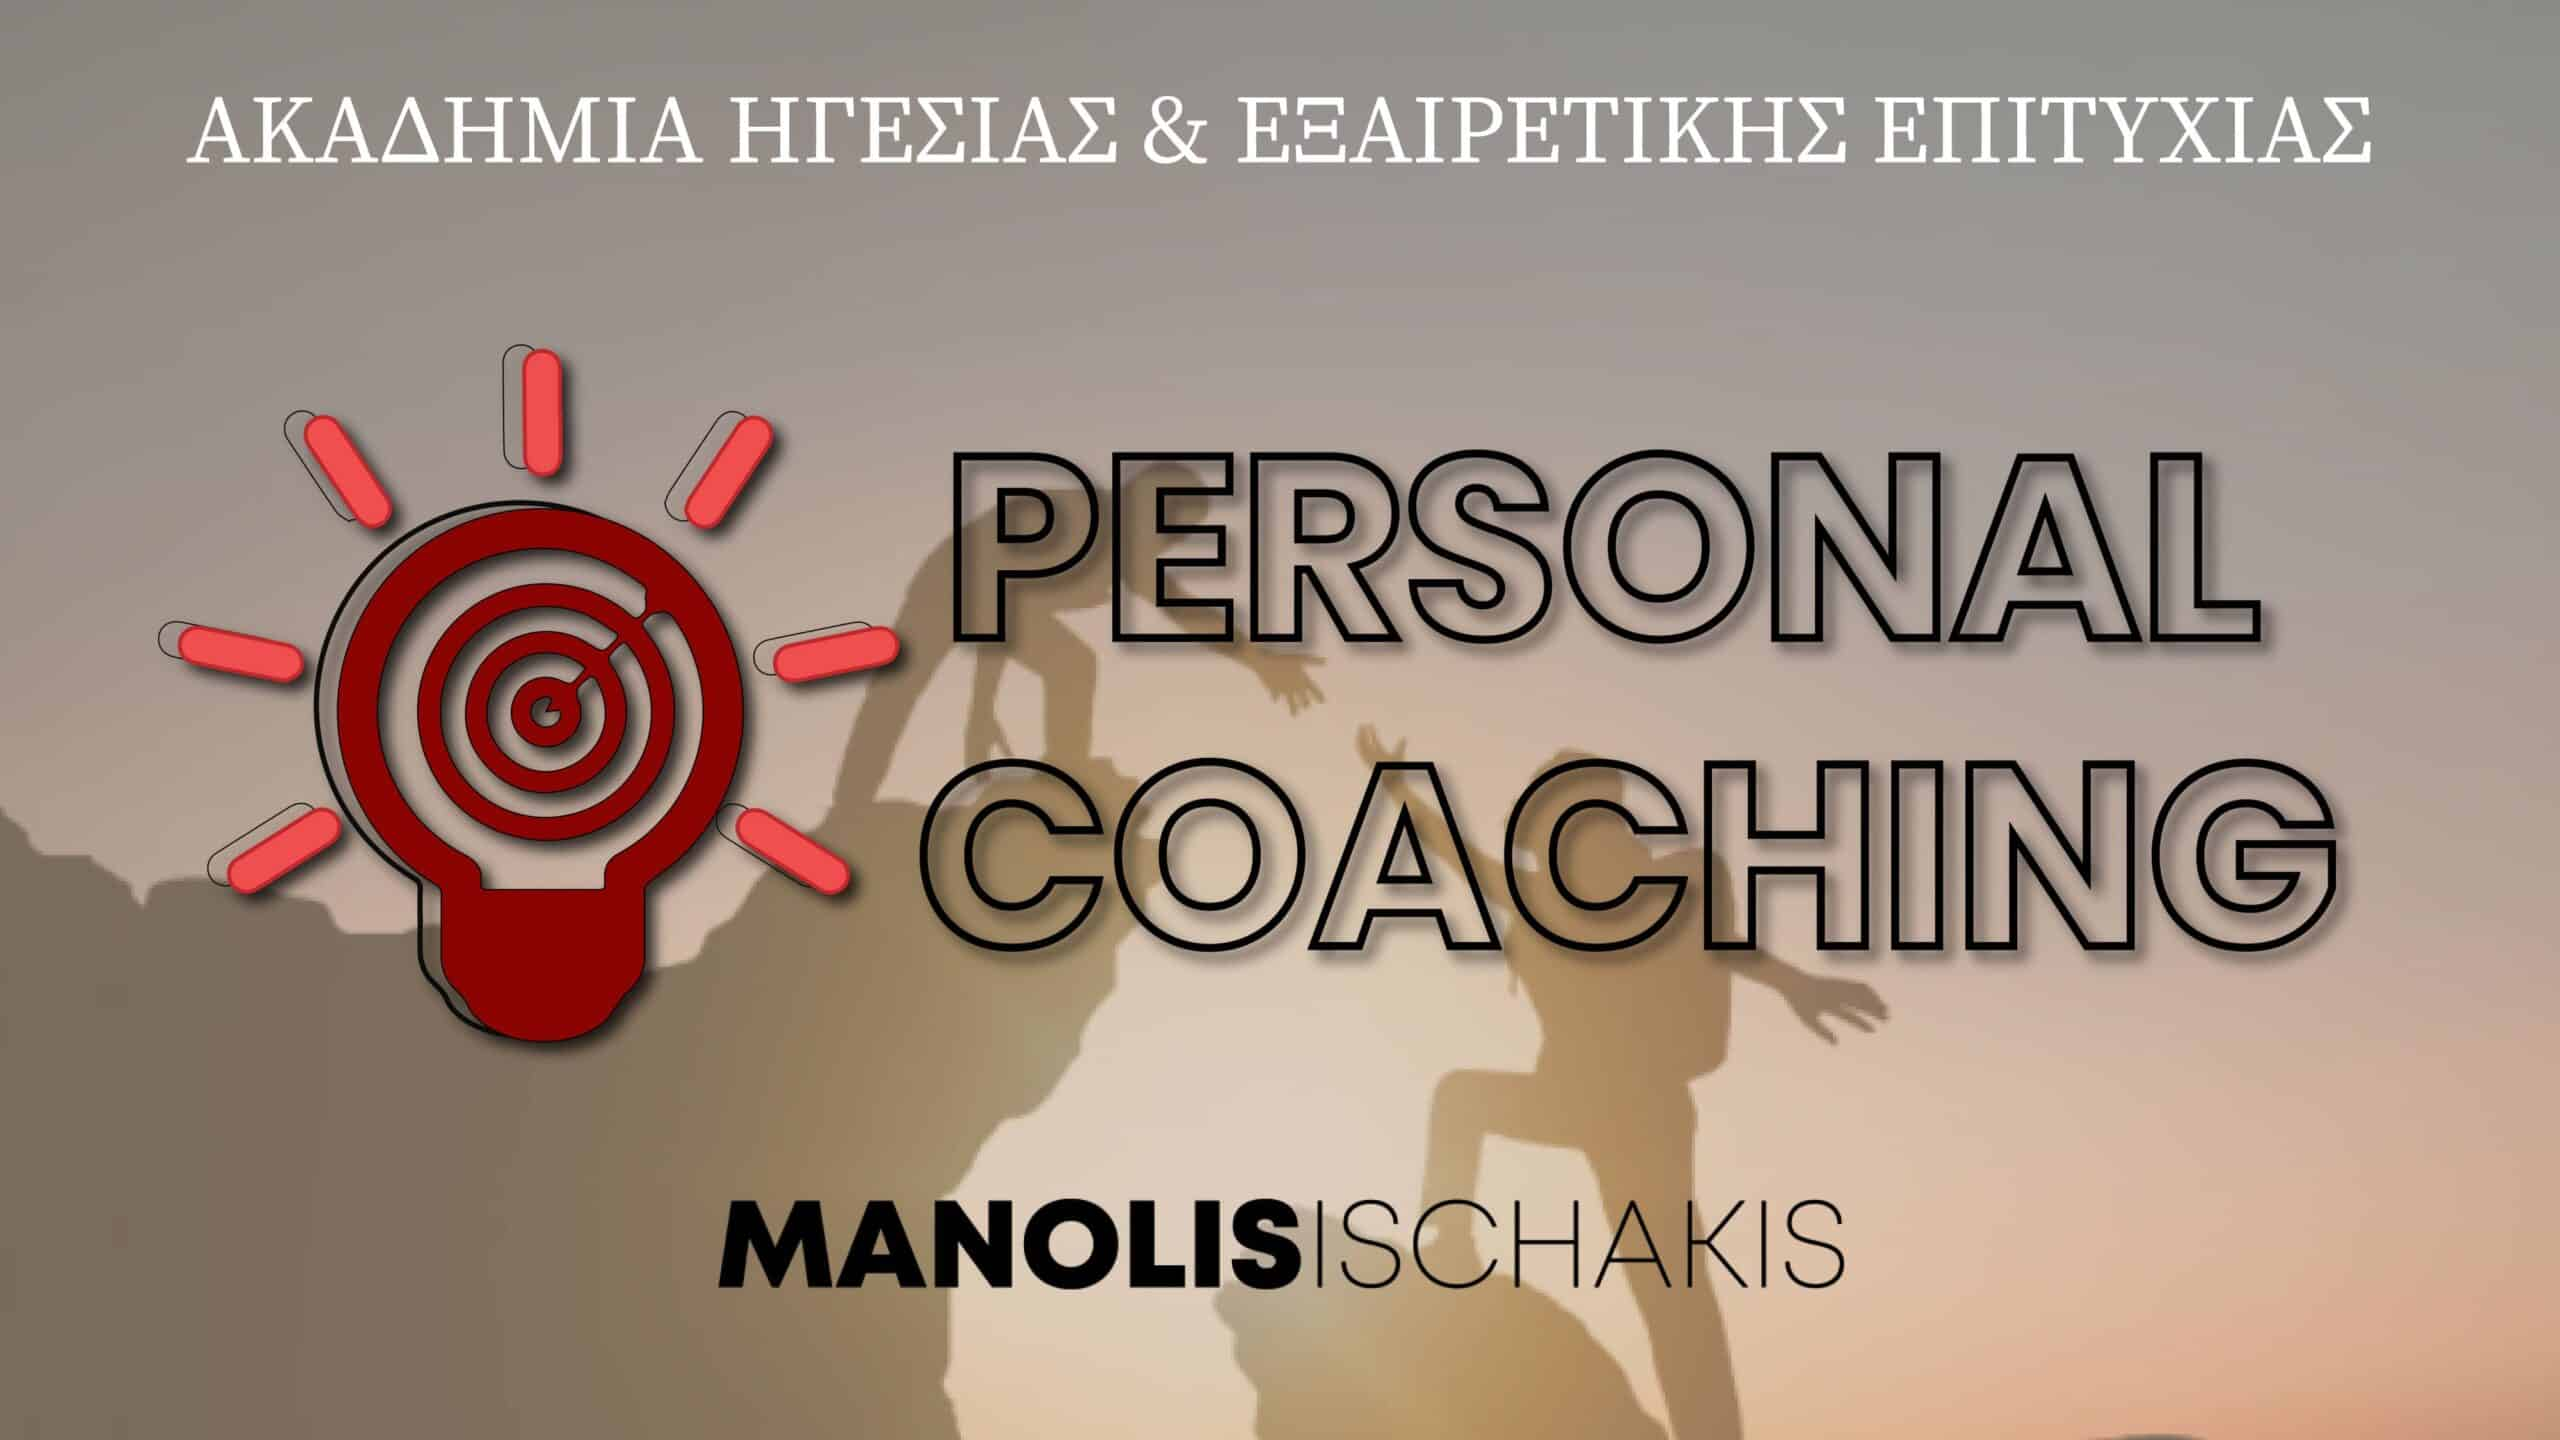 Personal Coaching Manolis Ischakis